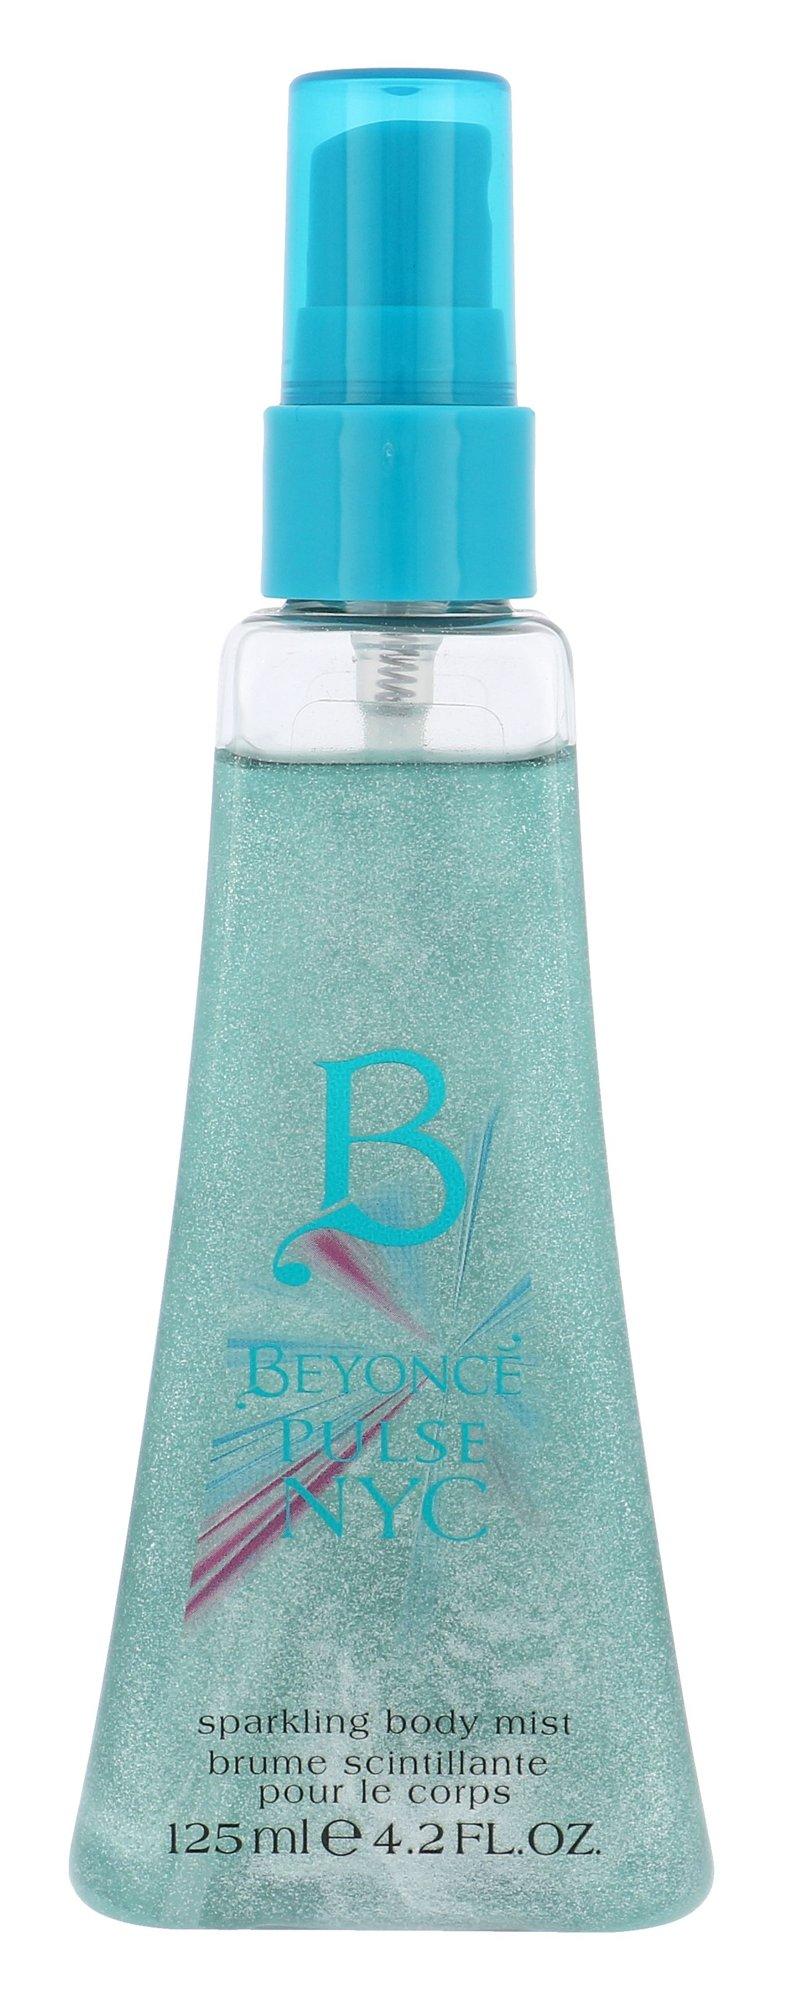 Beyonce Pulse NYC Body veil 125ml